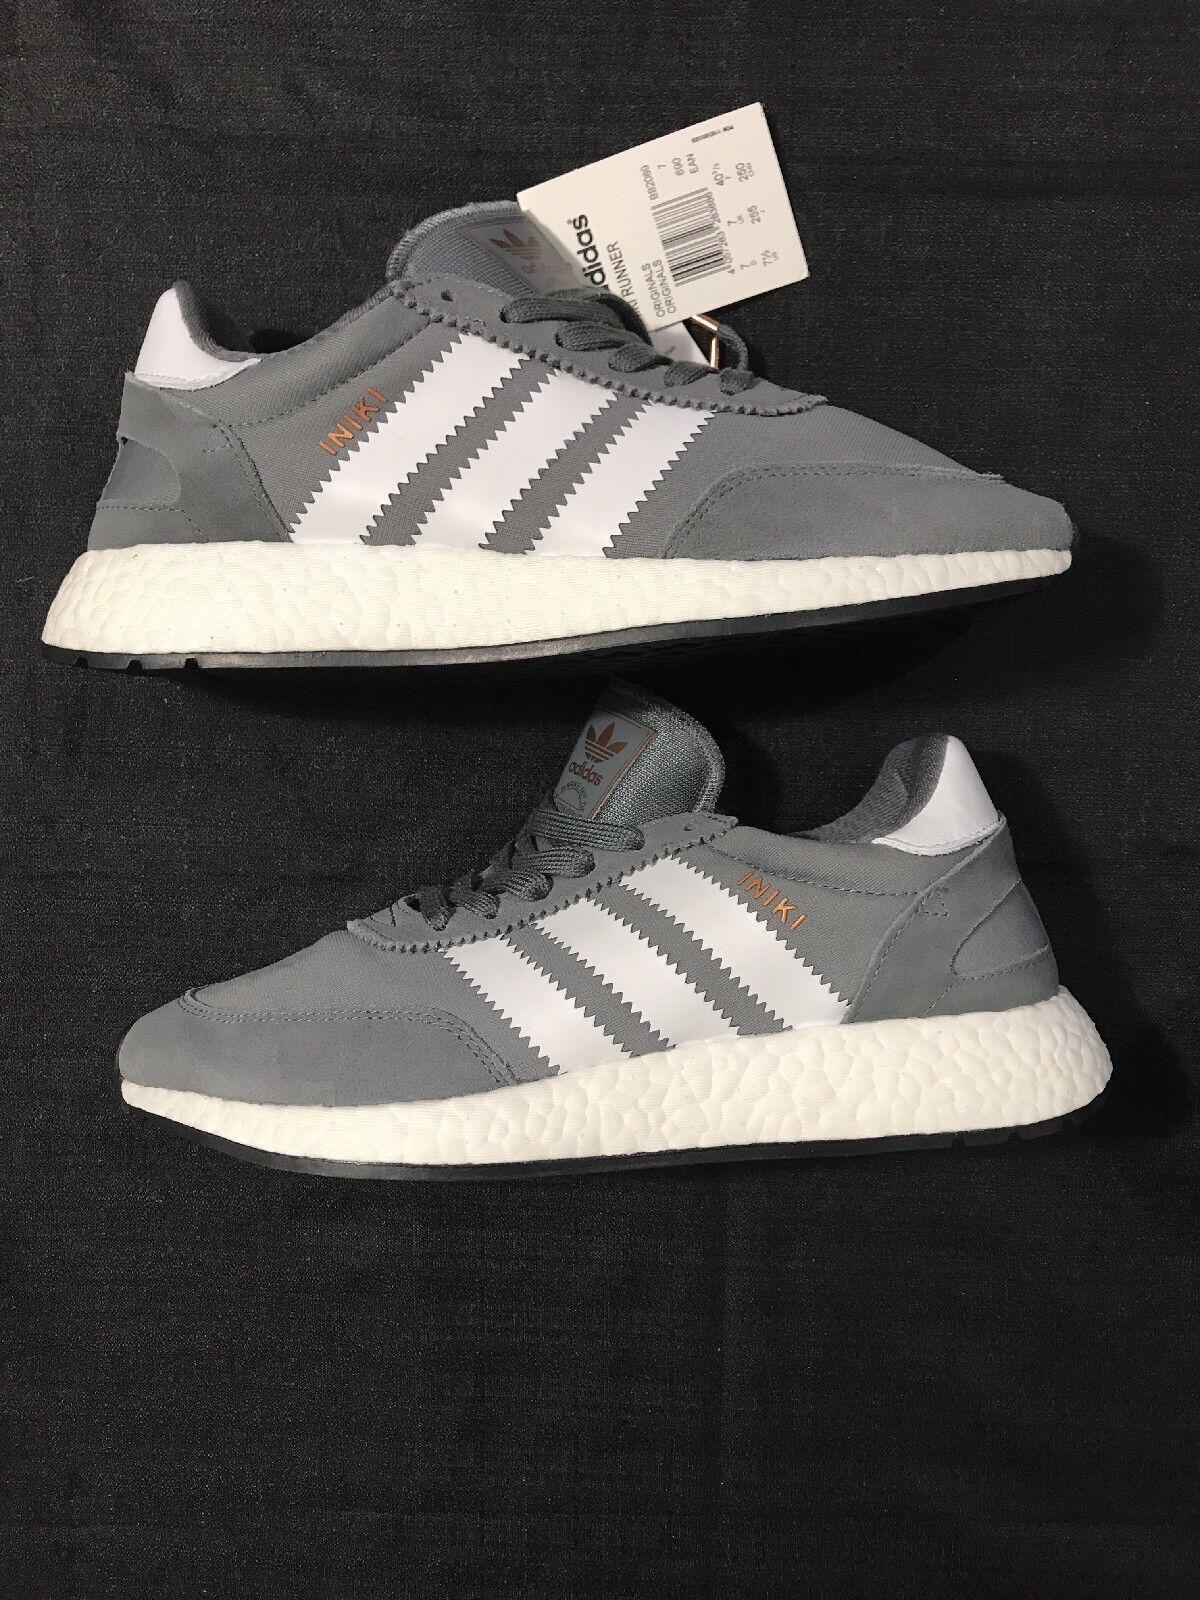 Adidas INIKI Boost Runner Men's Size 7.5 BB2089. Vista Grey / White